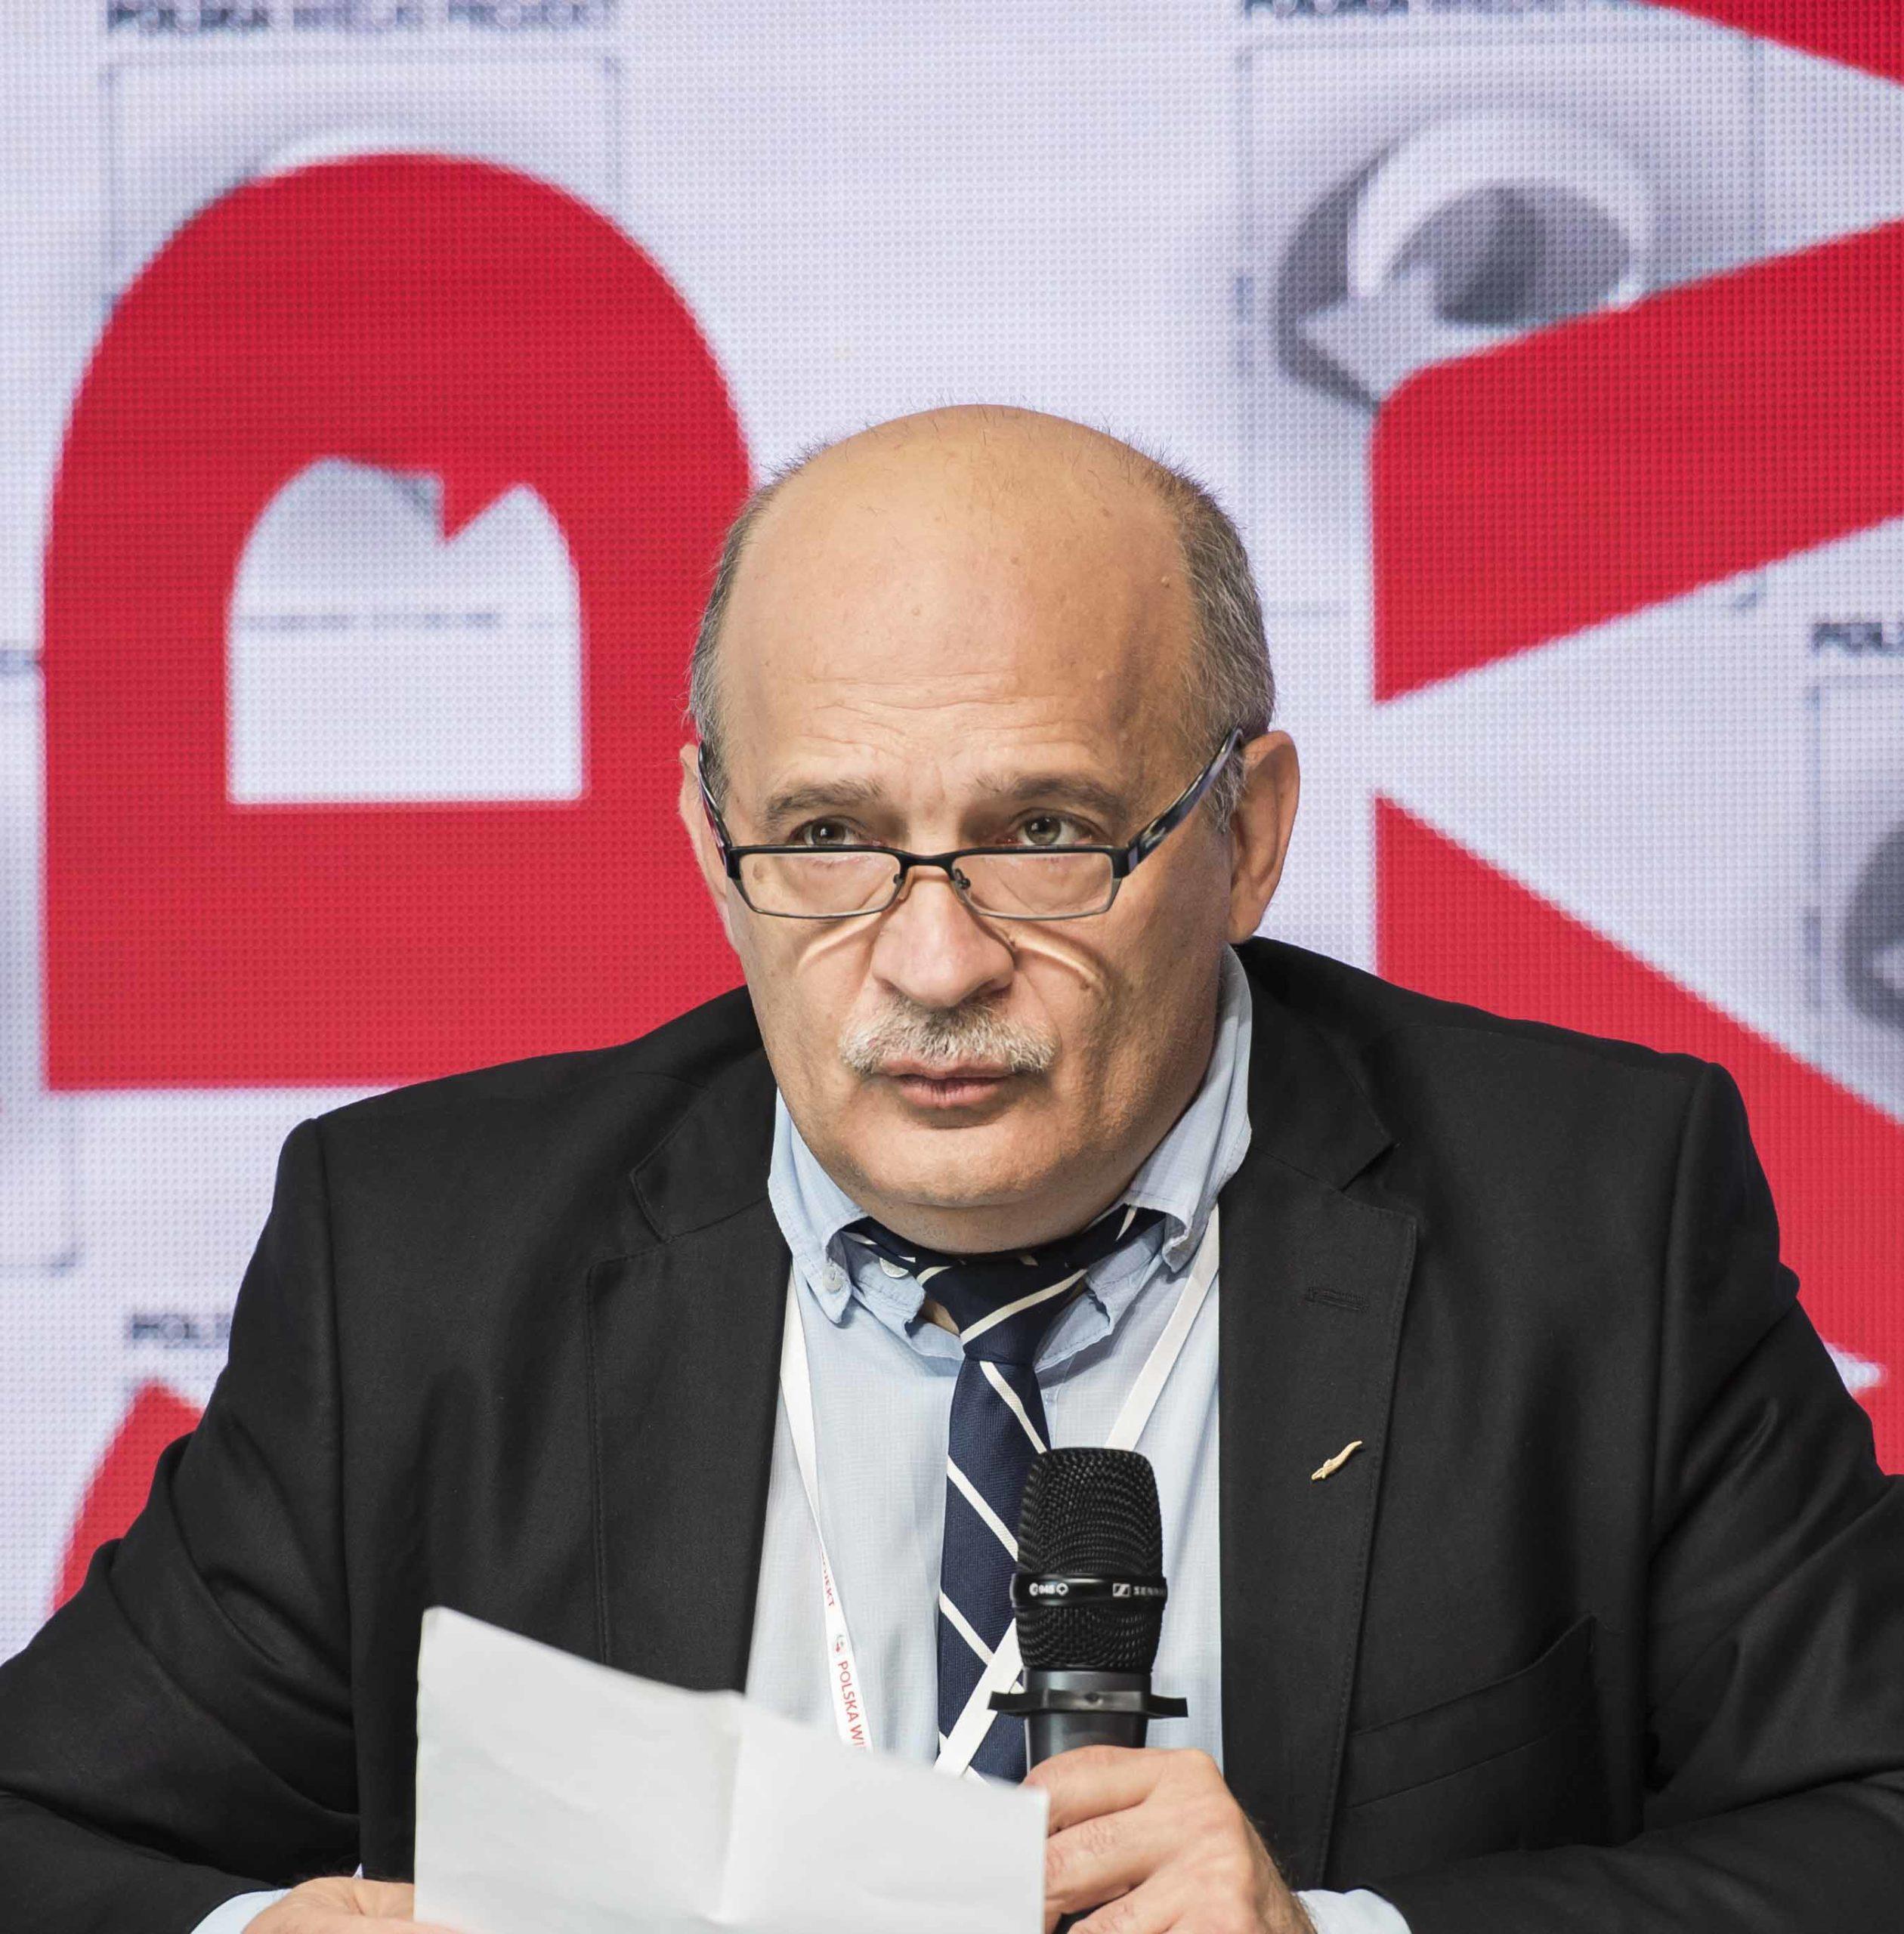 Florin Kubinschi, Kongres Polska Wielki projekt